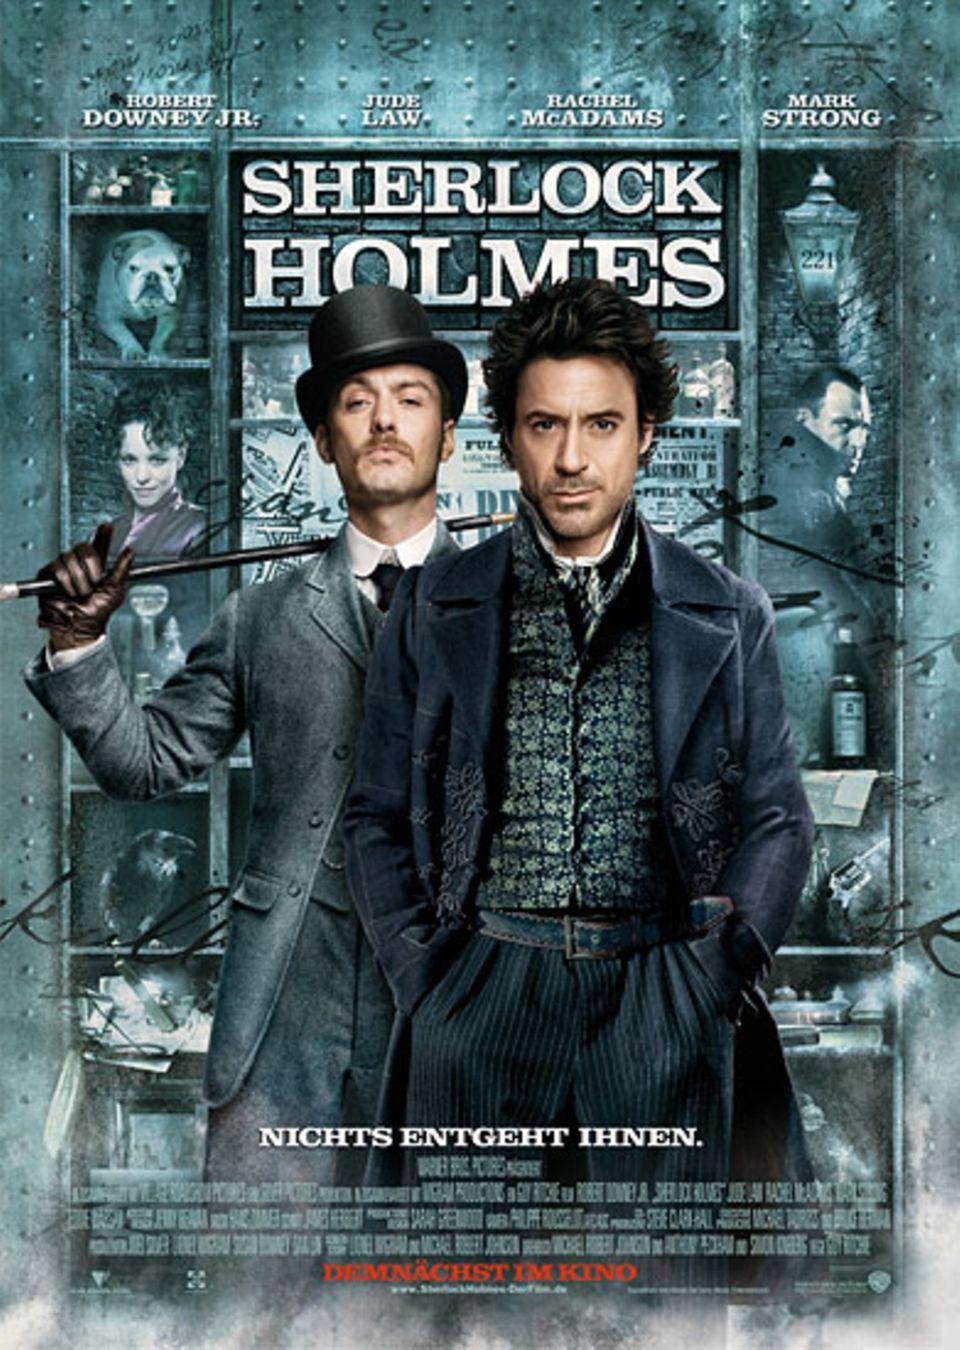 Kinotipp: Sherlock Holmes: Das offizielle Filmplakat